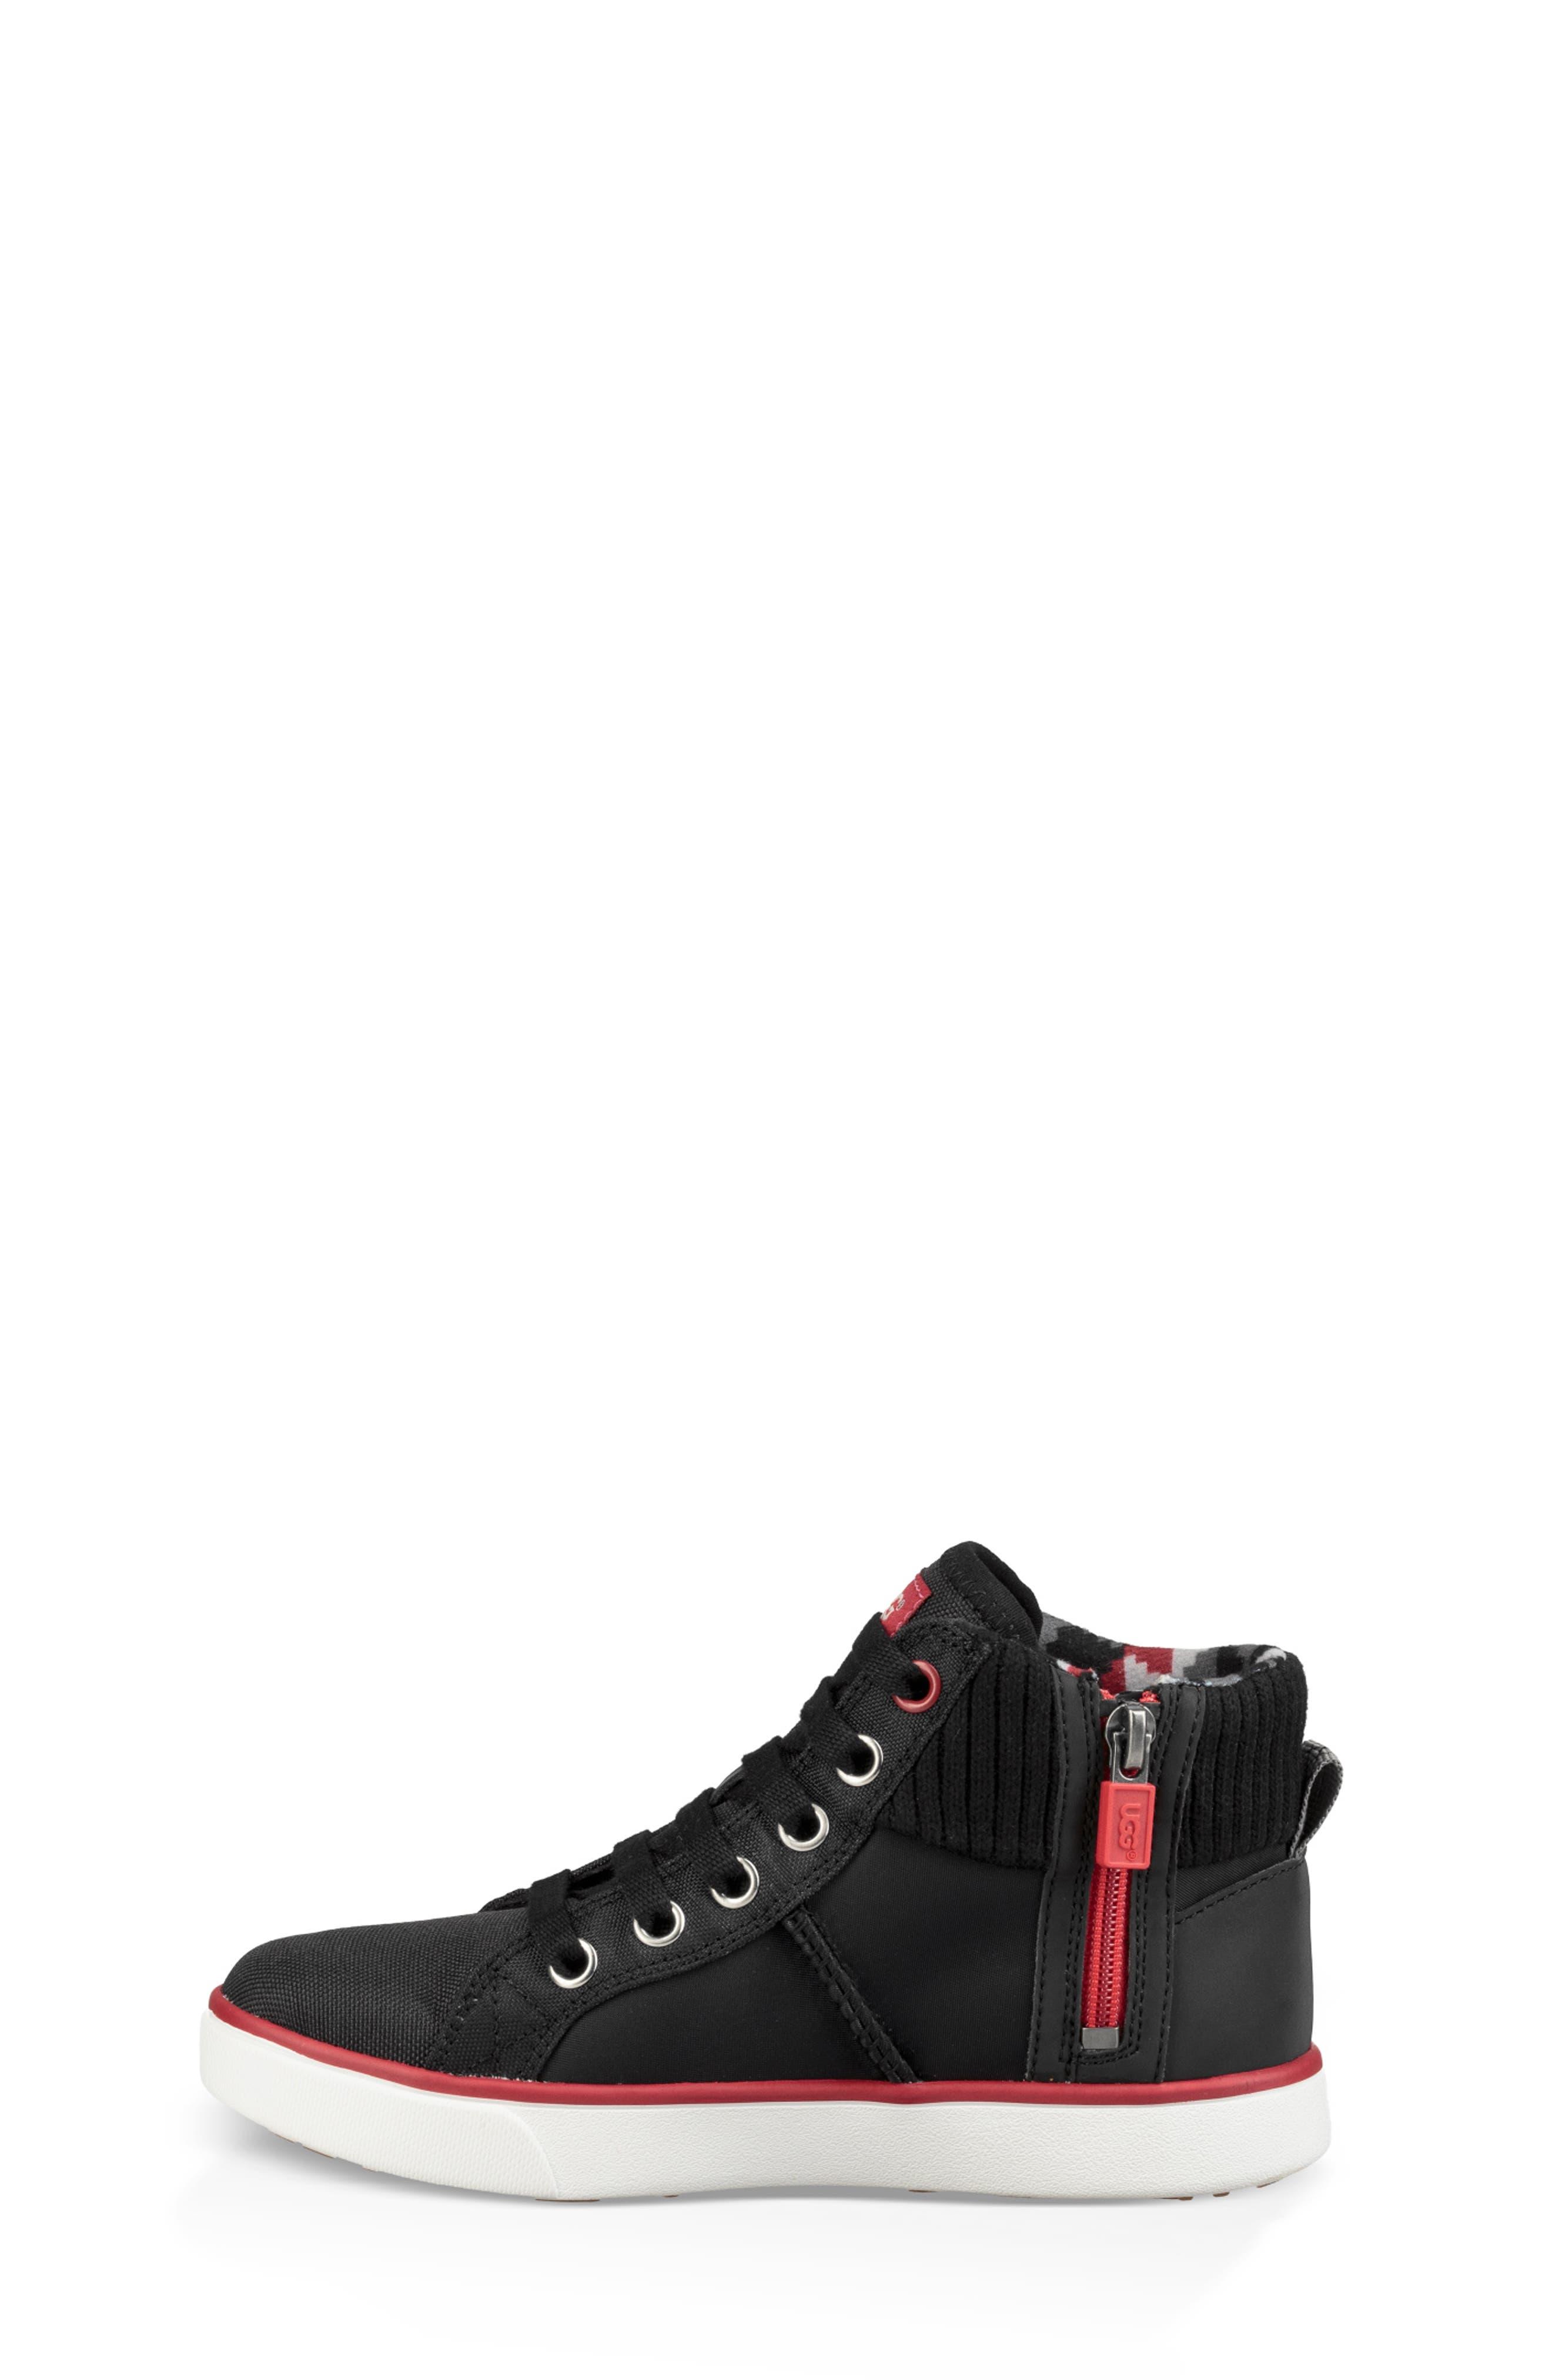 UGG<SUP>®</SUP>, Boscoe Sneaker, Alternate thumbnail 6, color, 001